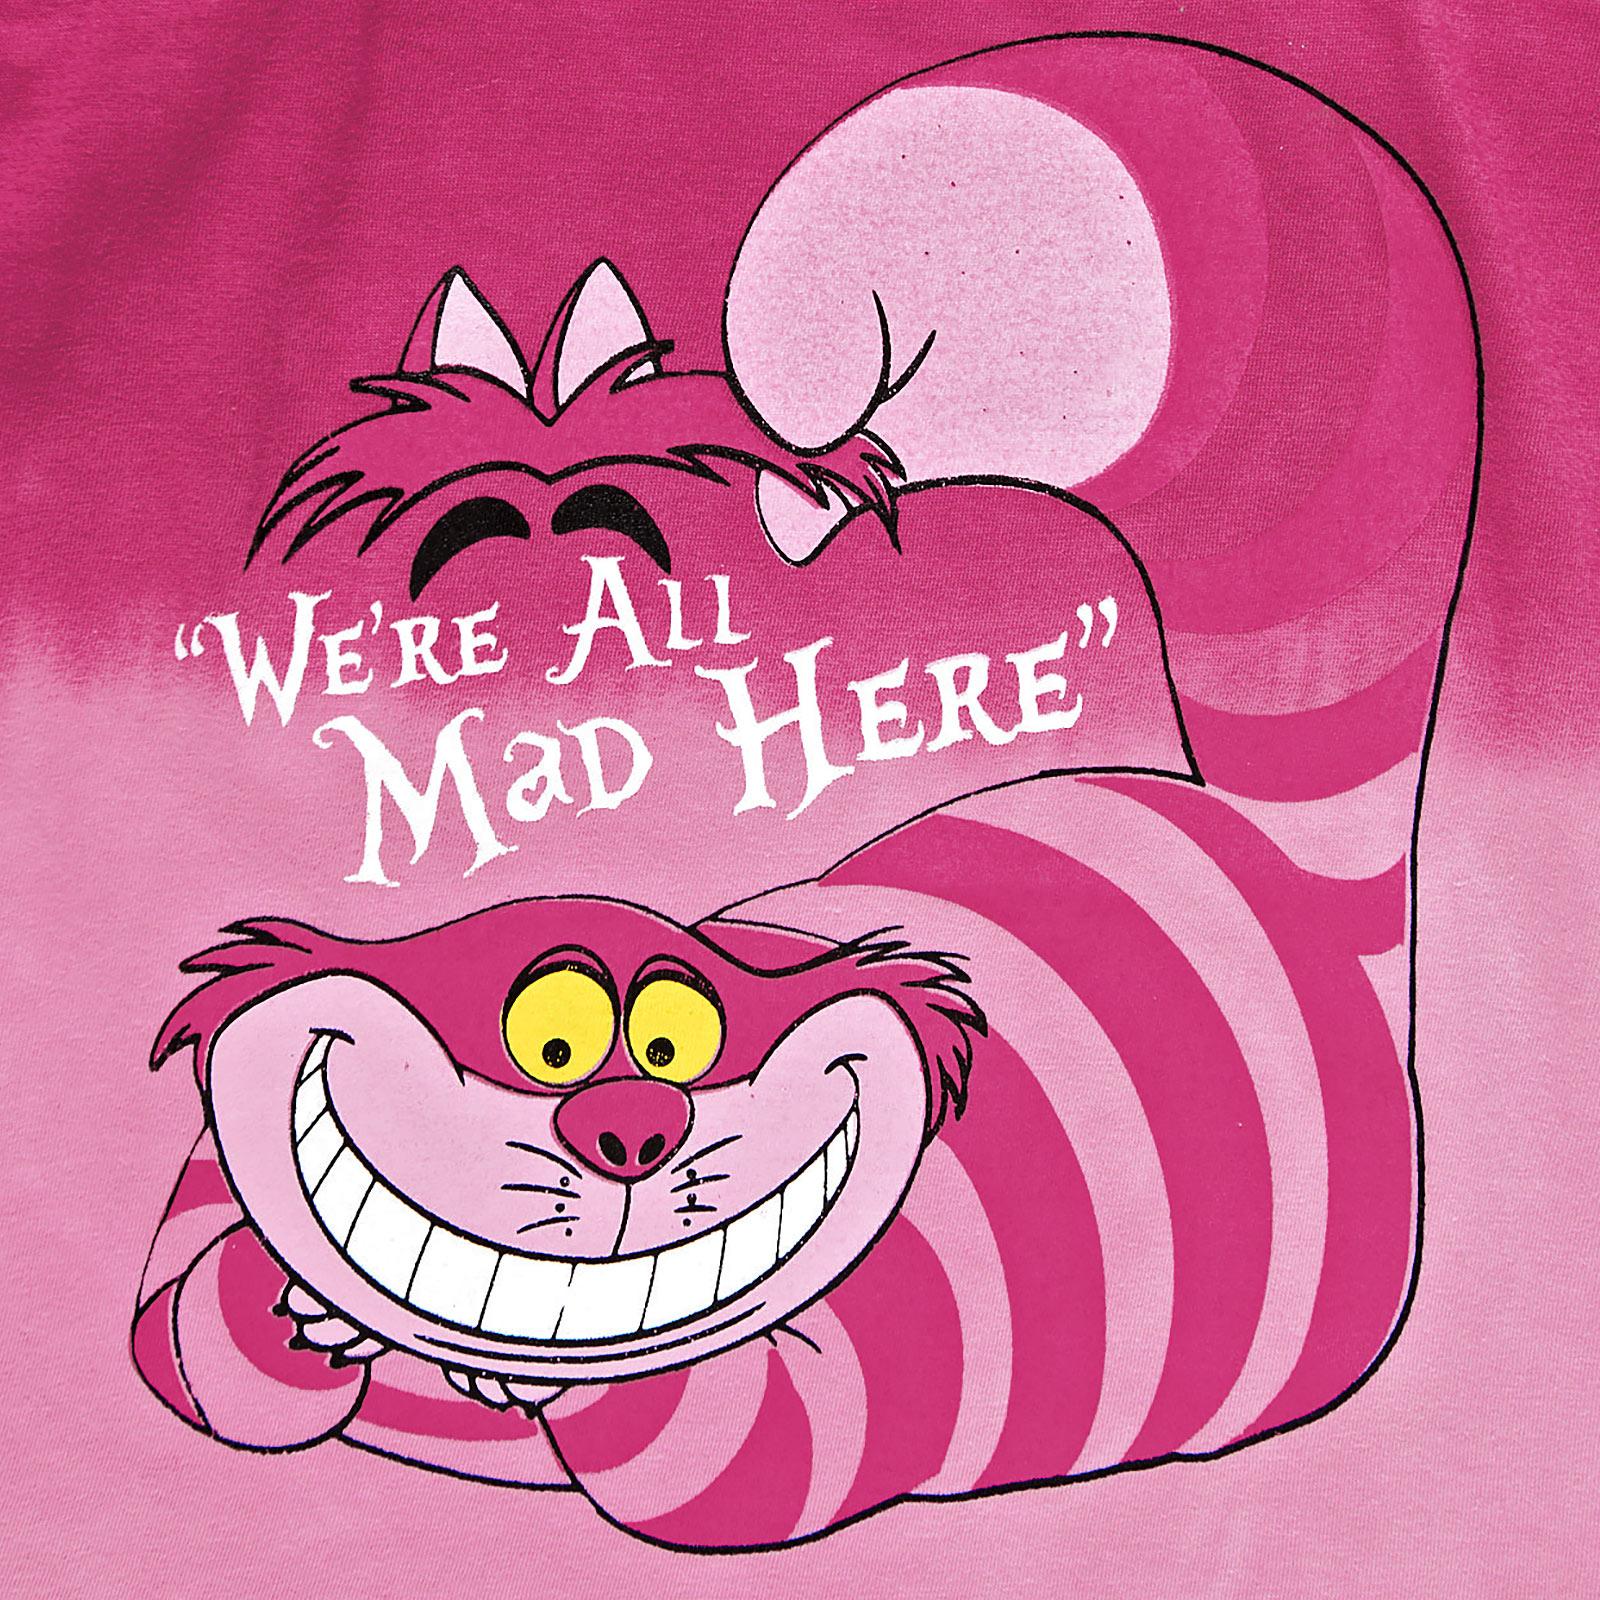 Alice im Wunderland - Grinsekatze Tank Top pink